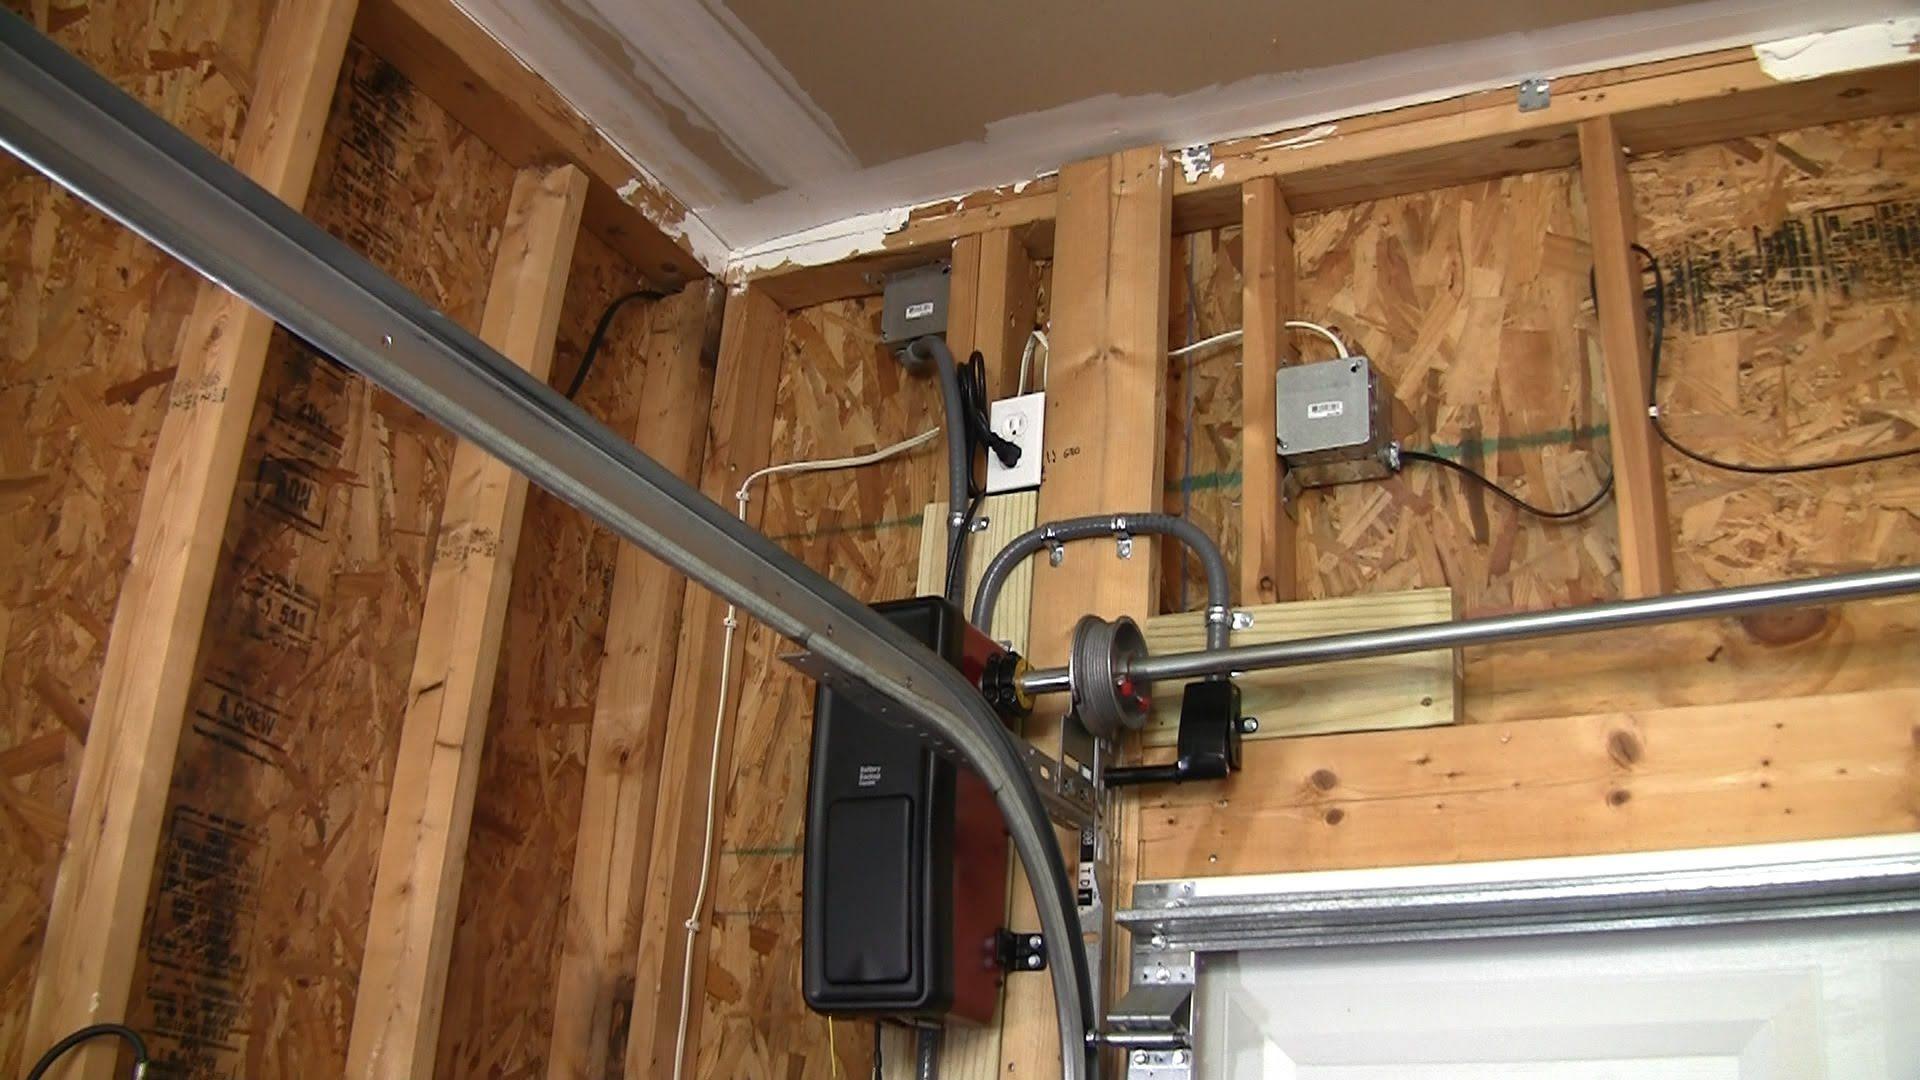 Liftmaster 8500 Jackshaft Complete Install Side mount